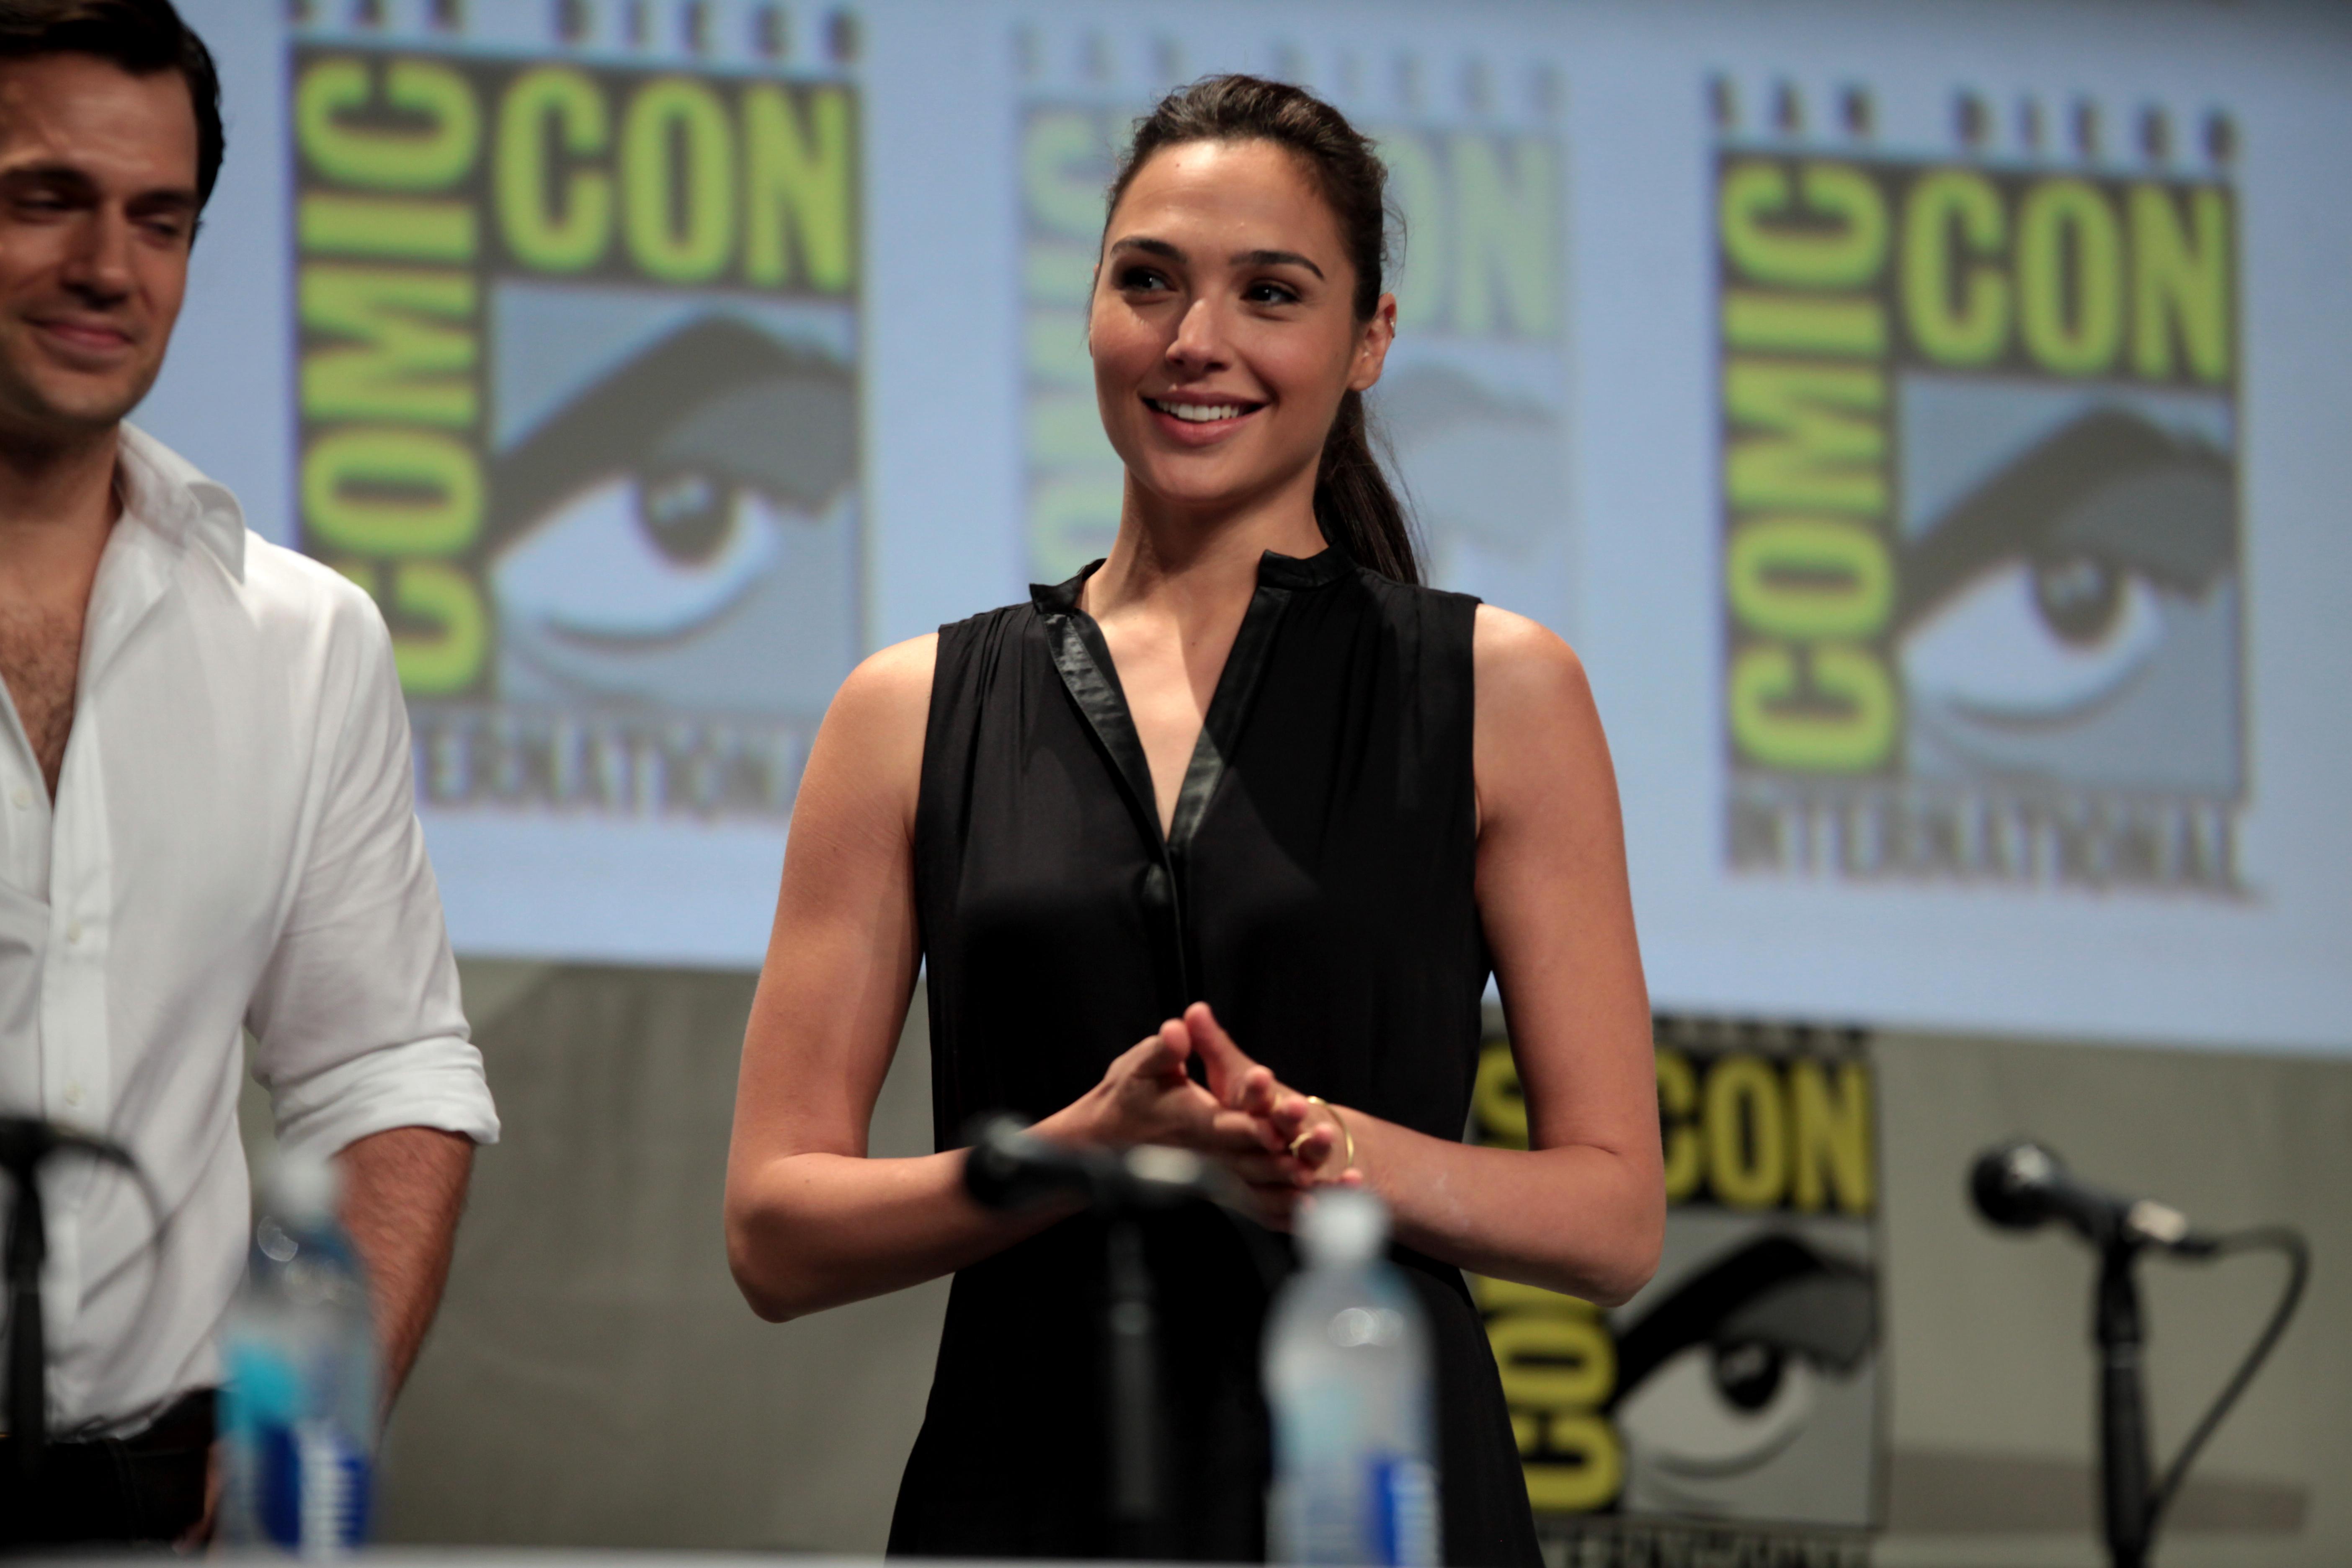 http://upload.wikimedia.org/wikipedia/commons/c/c9/Gal_Gadot_2014_Comic_Con.jpg